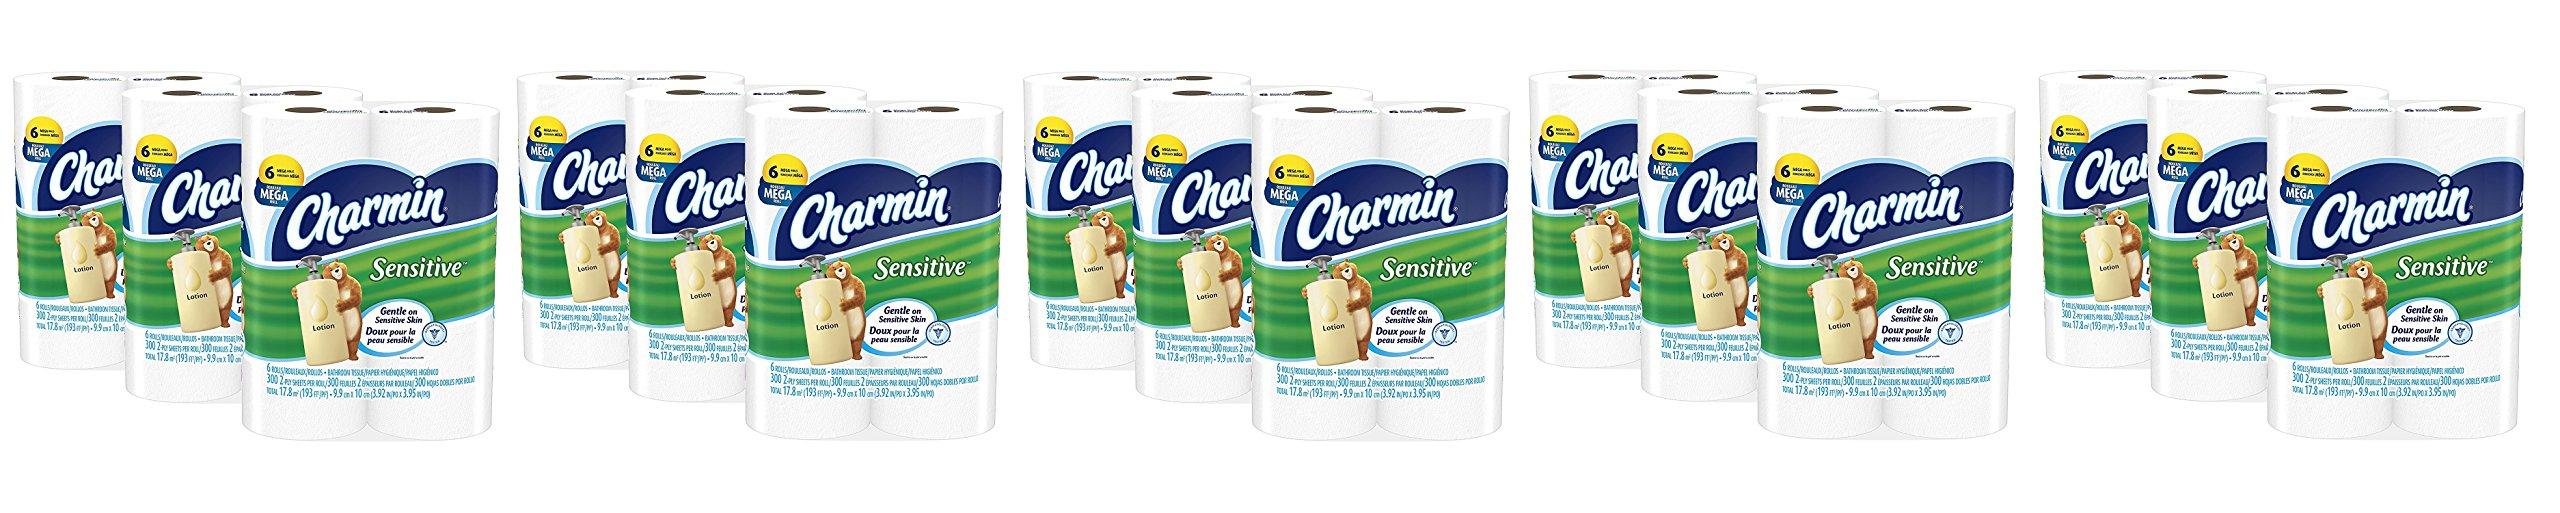 Charmin QOxWir Sensitive Toilet Paper, Mega Roll,Bath Tissue, 5 Pack of 18